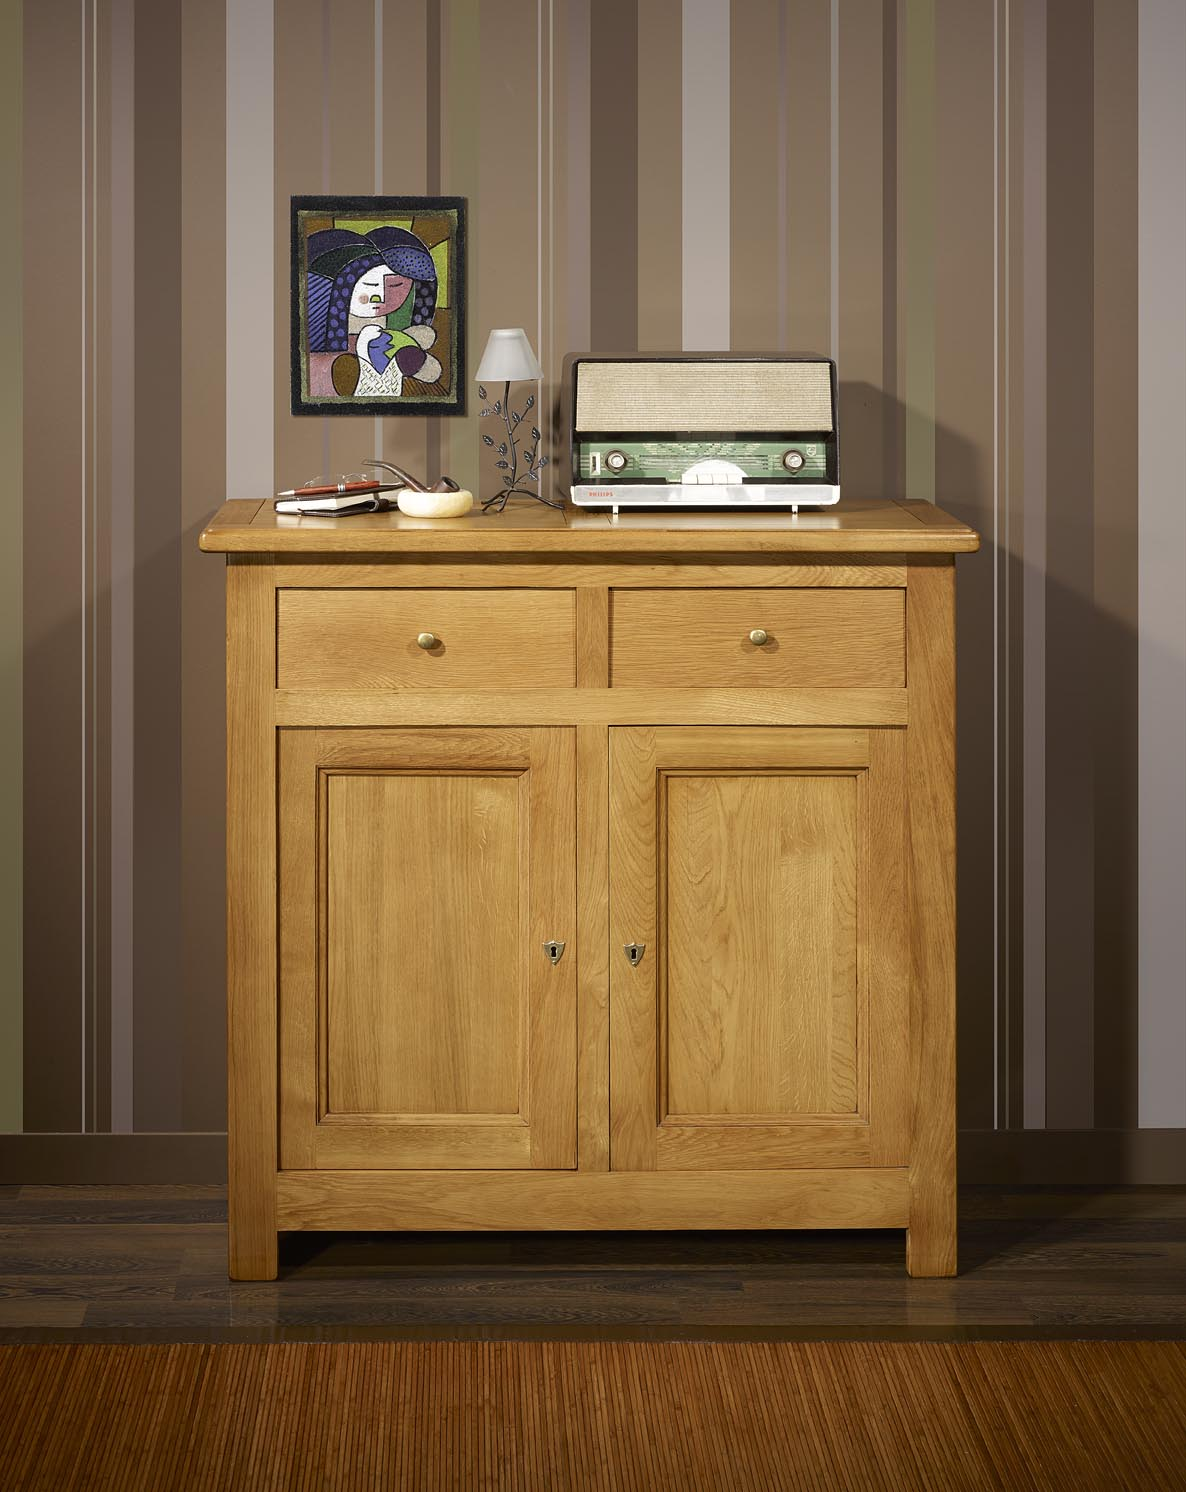 petit buffet 2 portes 2 tiroirs en ch ne massif de style campagnard finition ch ne dor patine. Black Bedroom Furniture Sets. Home Design Ideas